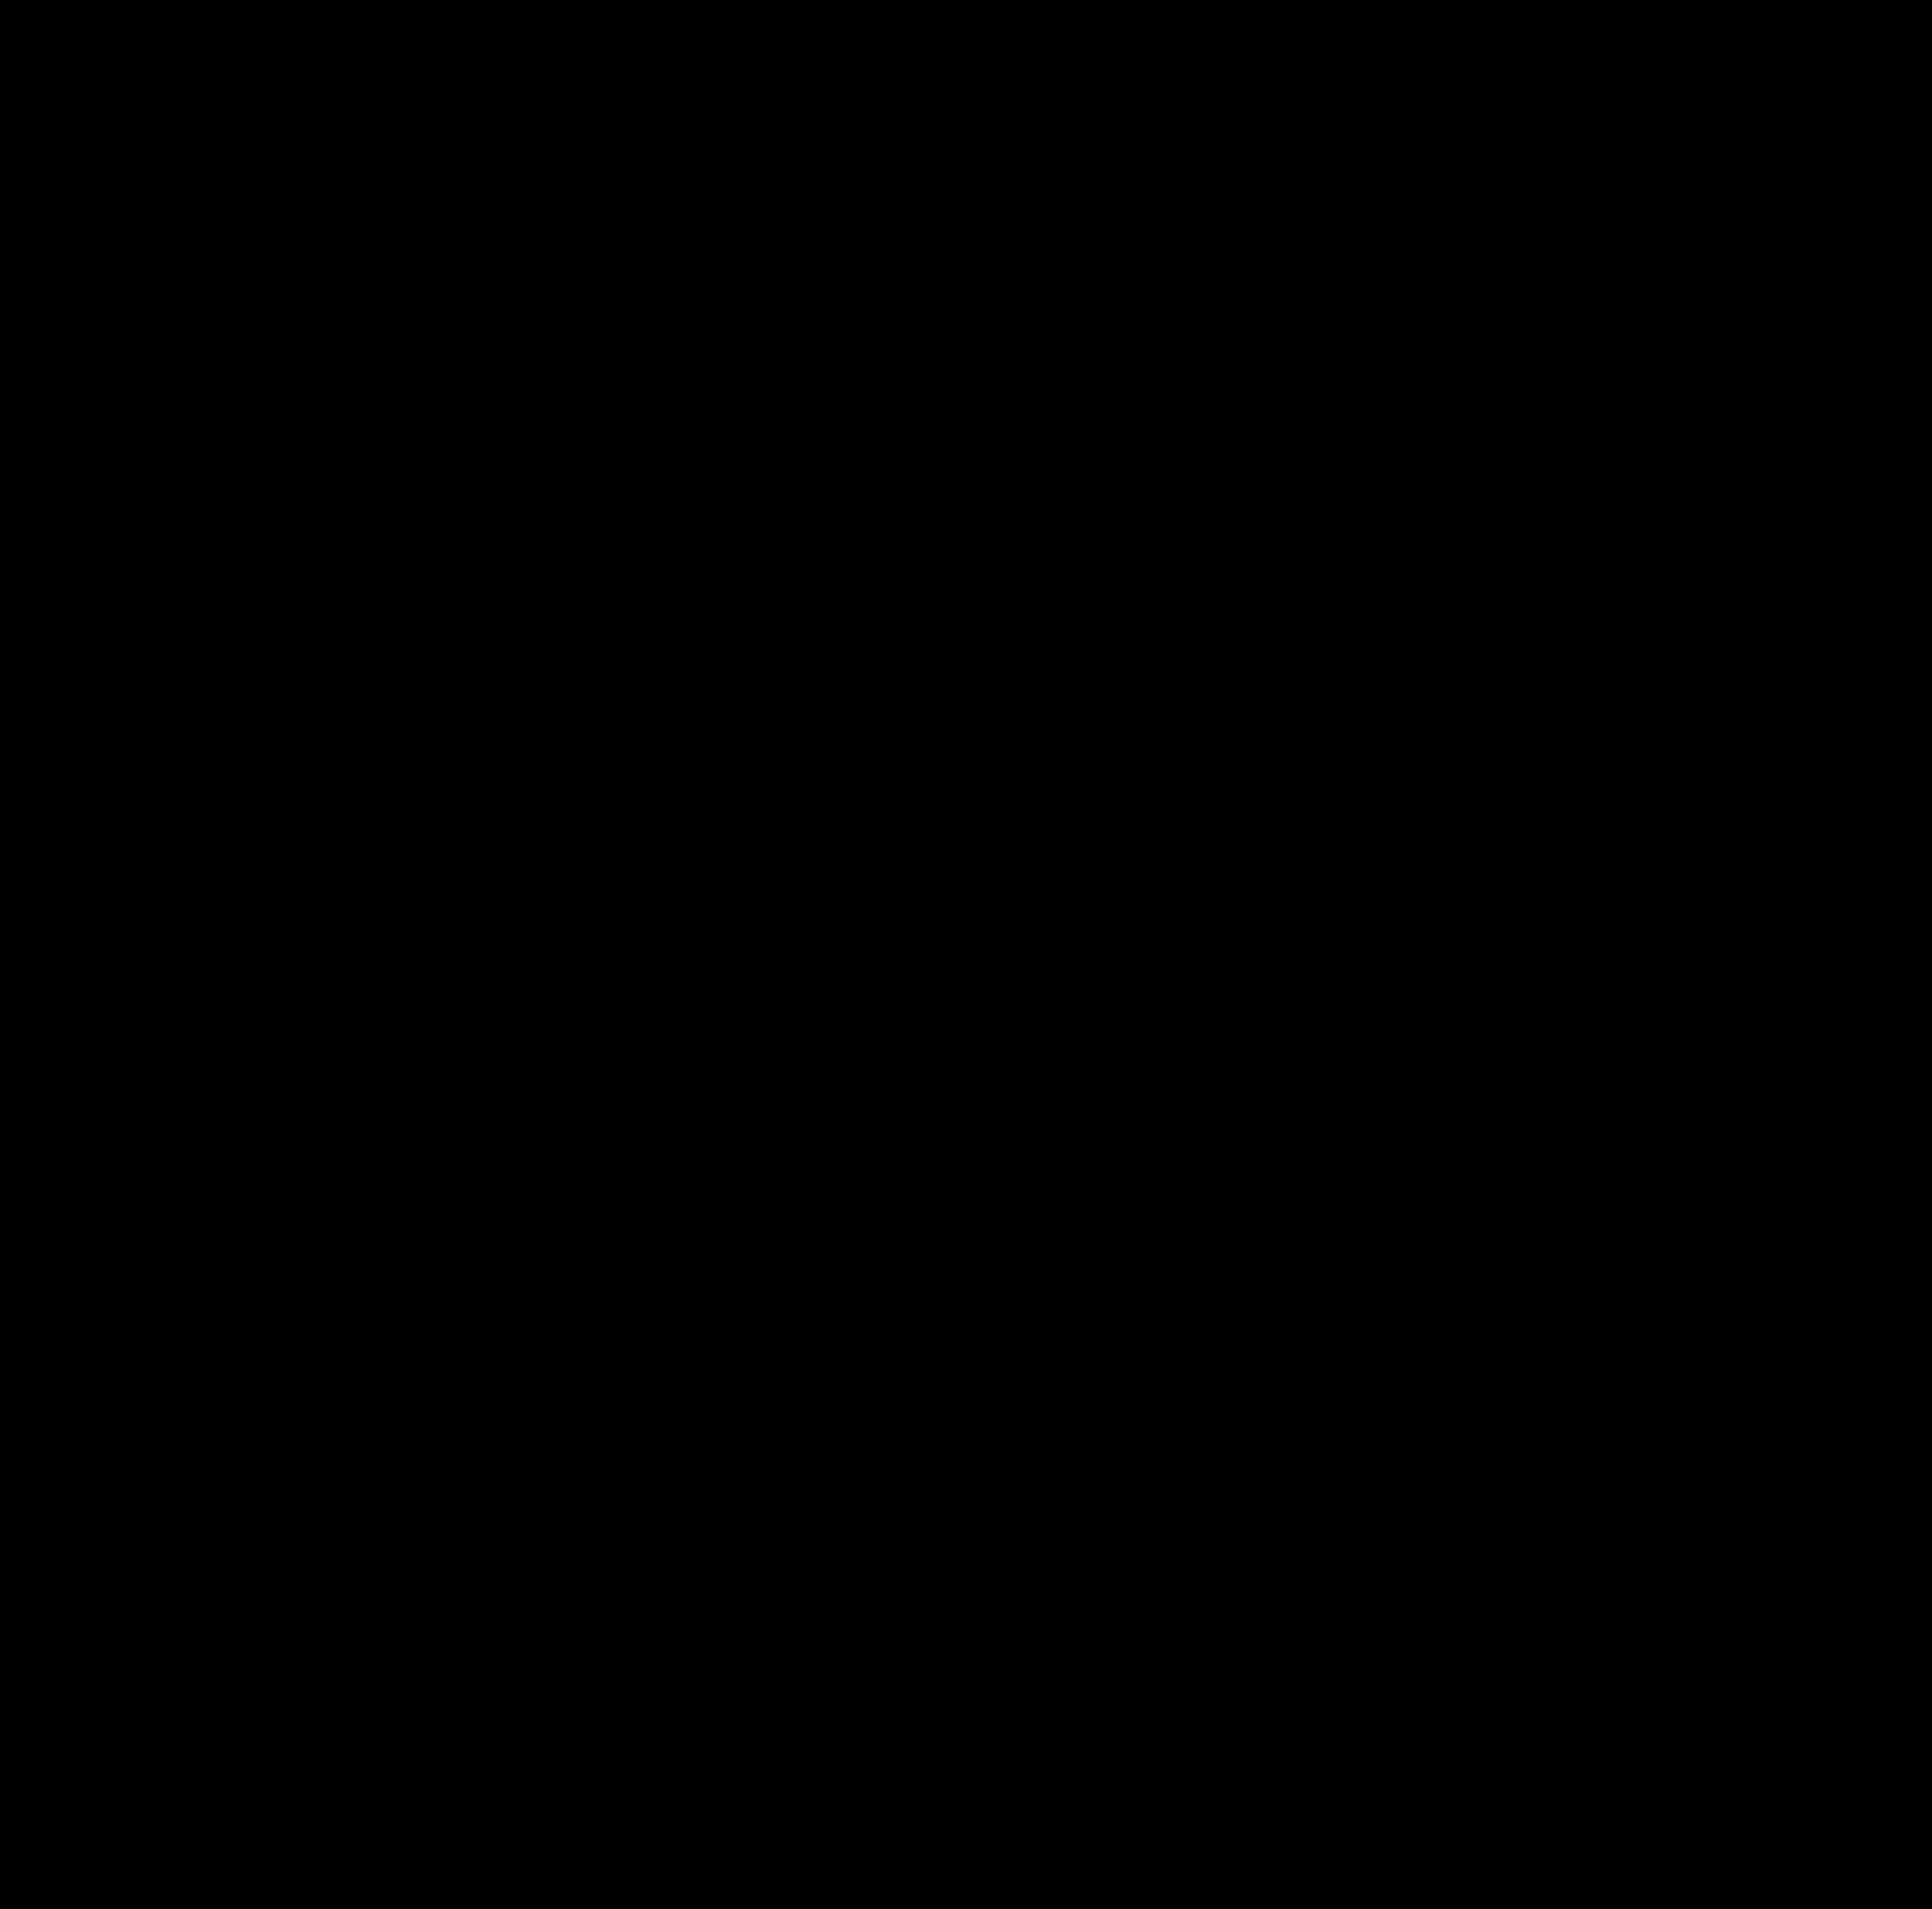 BIG IMAGE (PNG) - Crossed Swords PNG HD